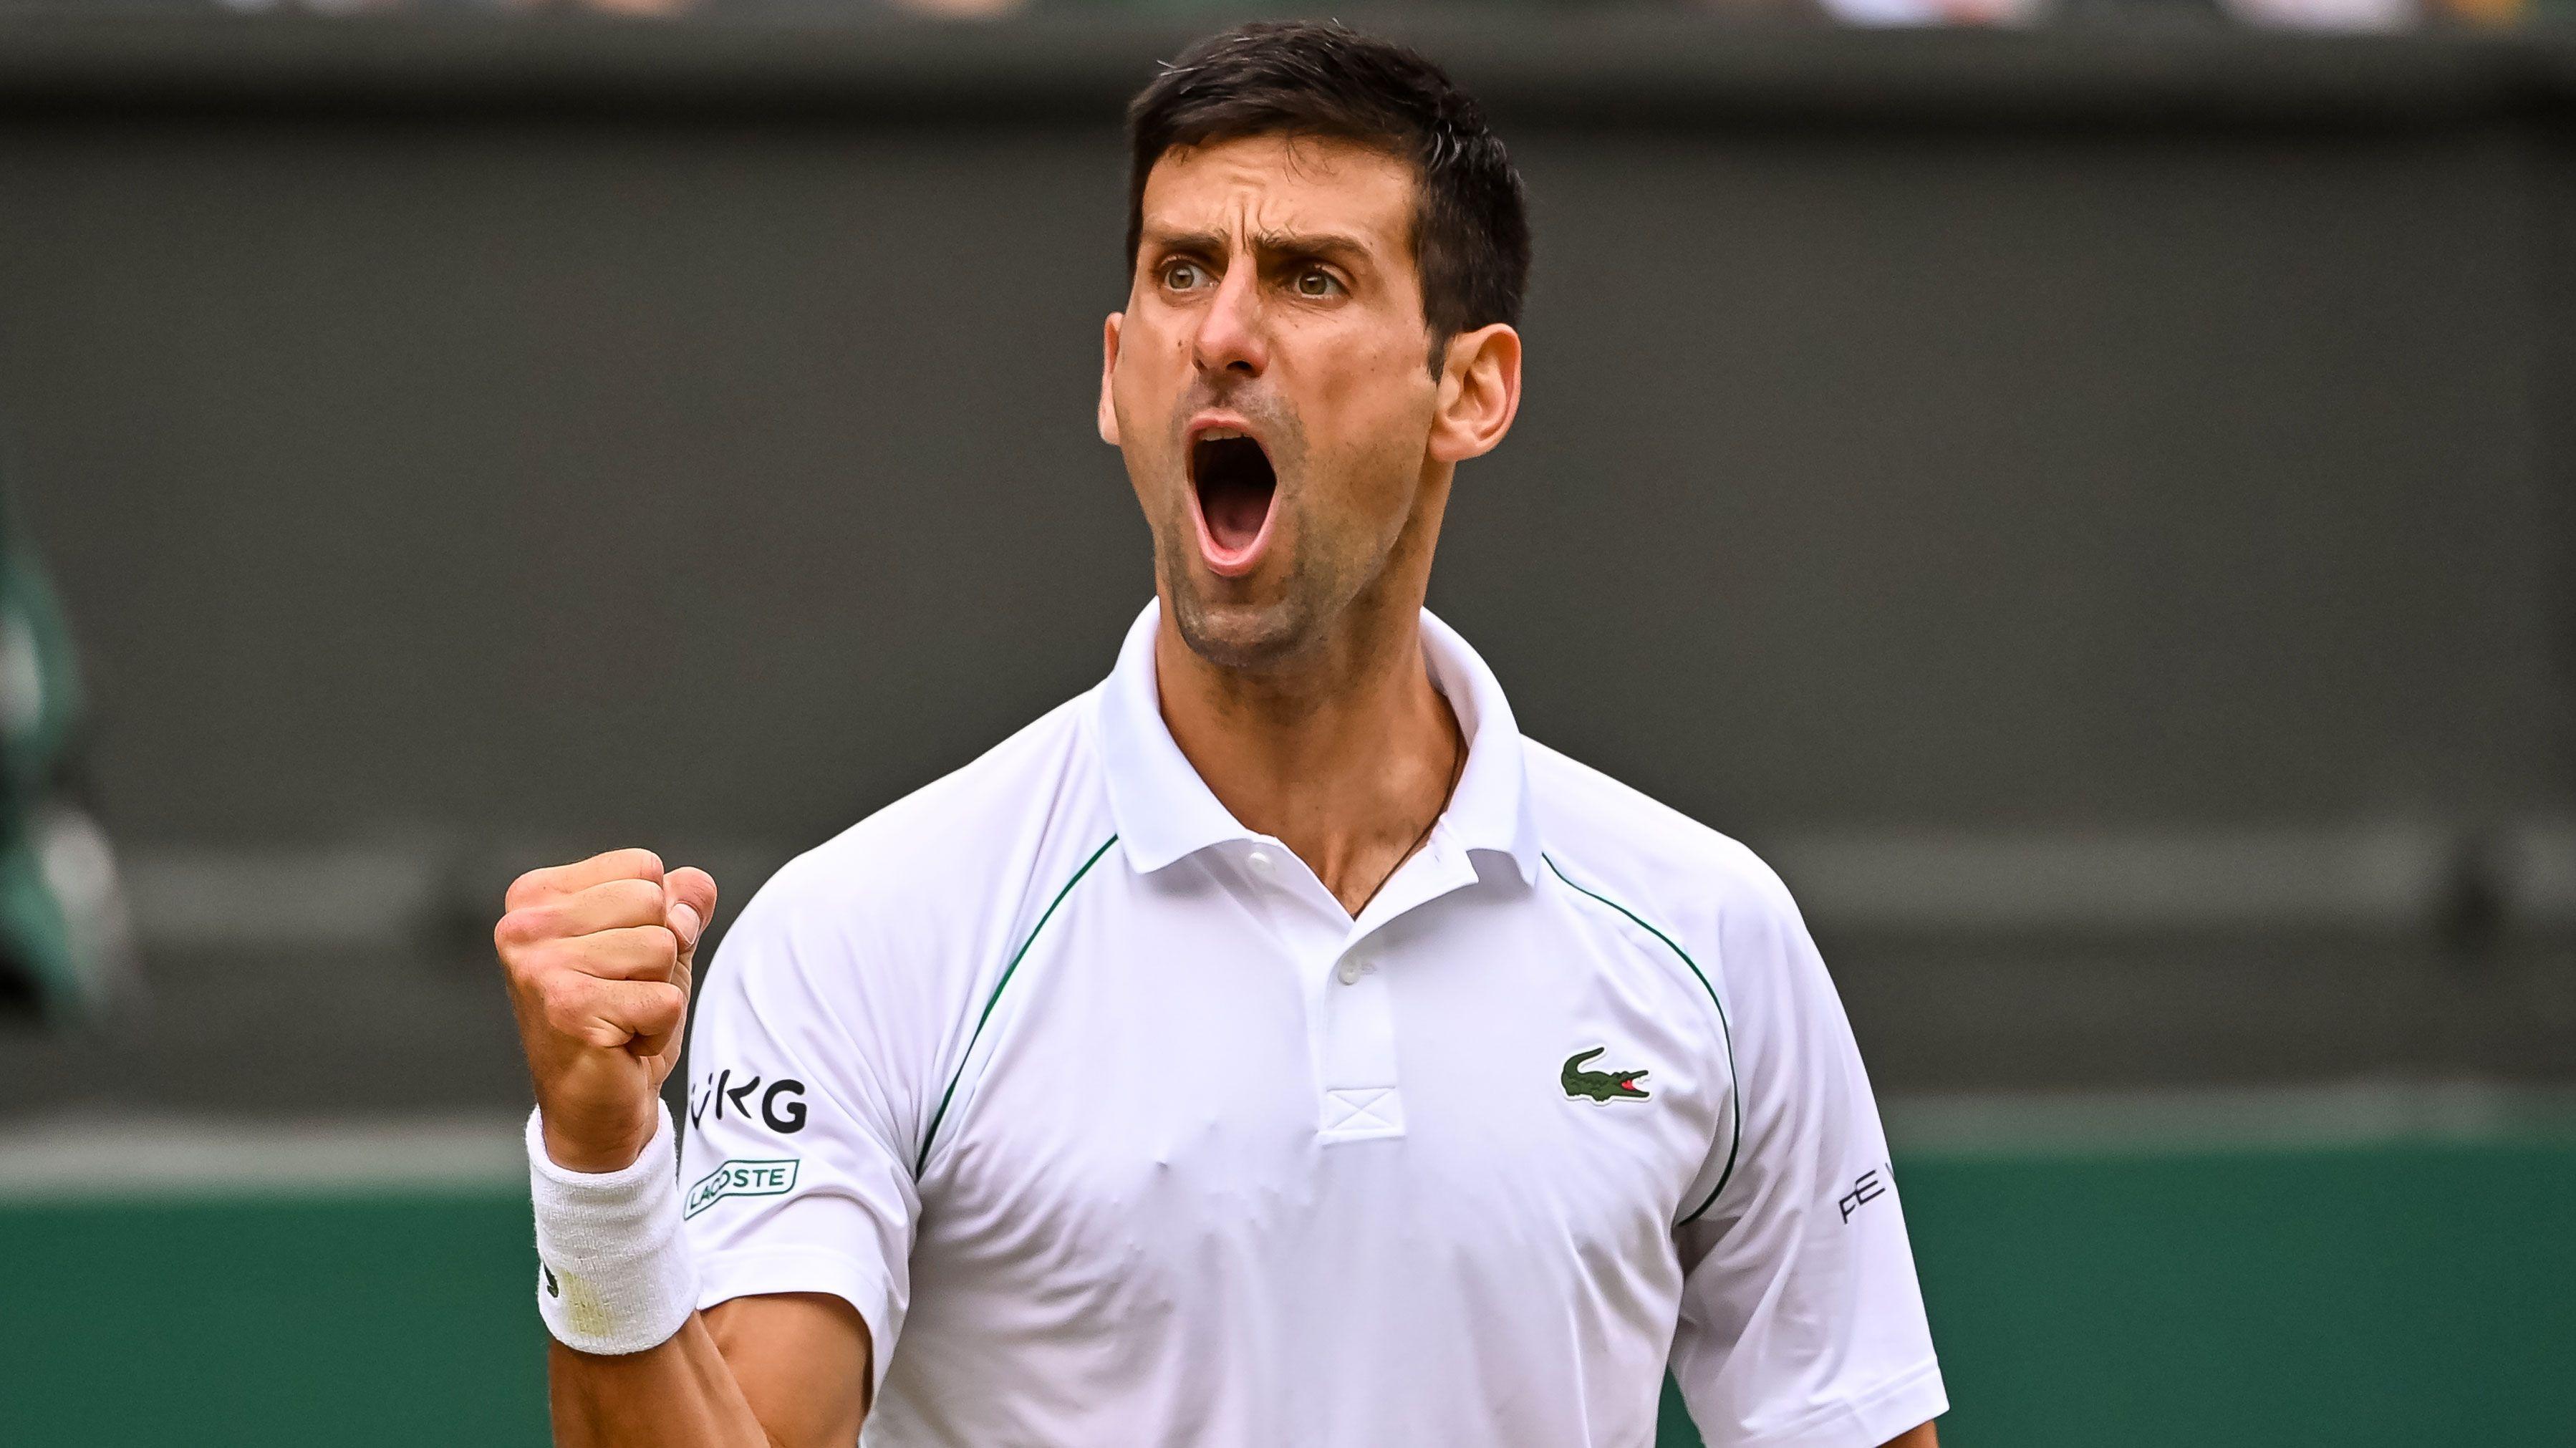 Novak Djokovic edging towards more history as he advances to Wimbledon final